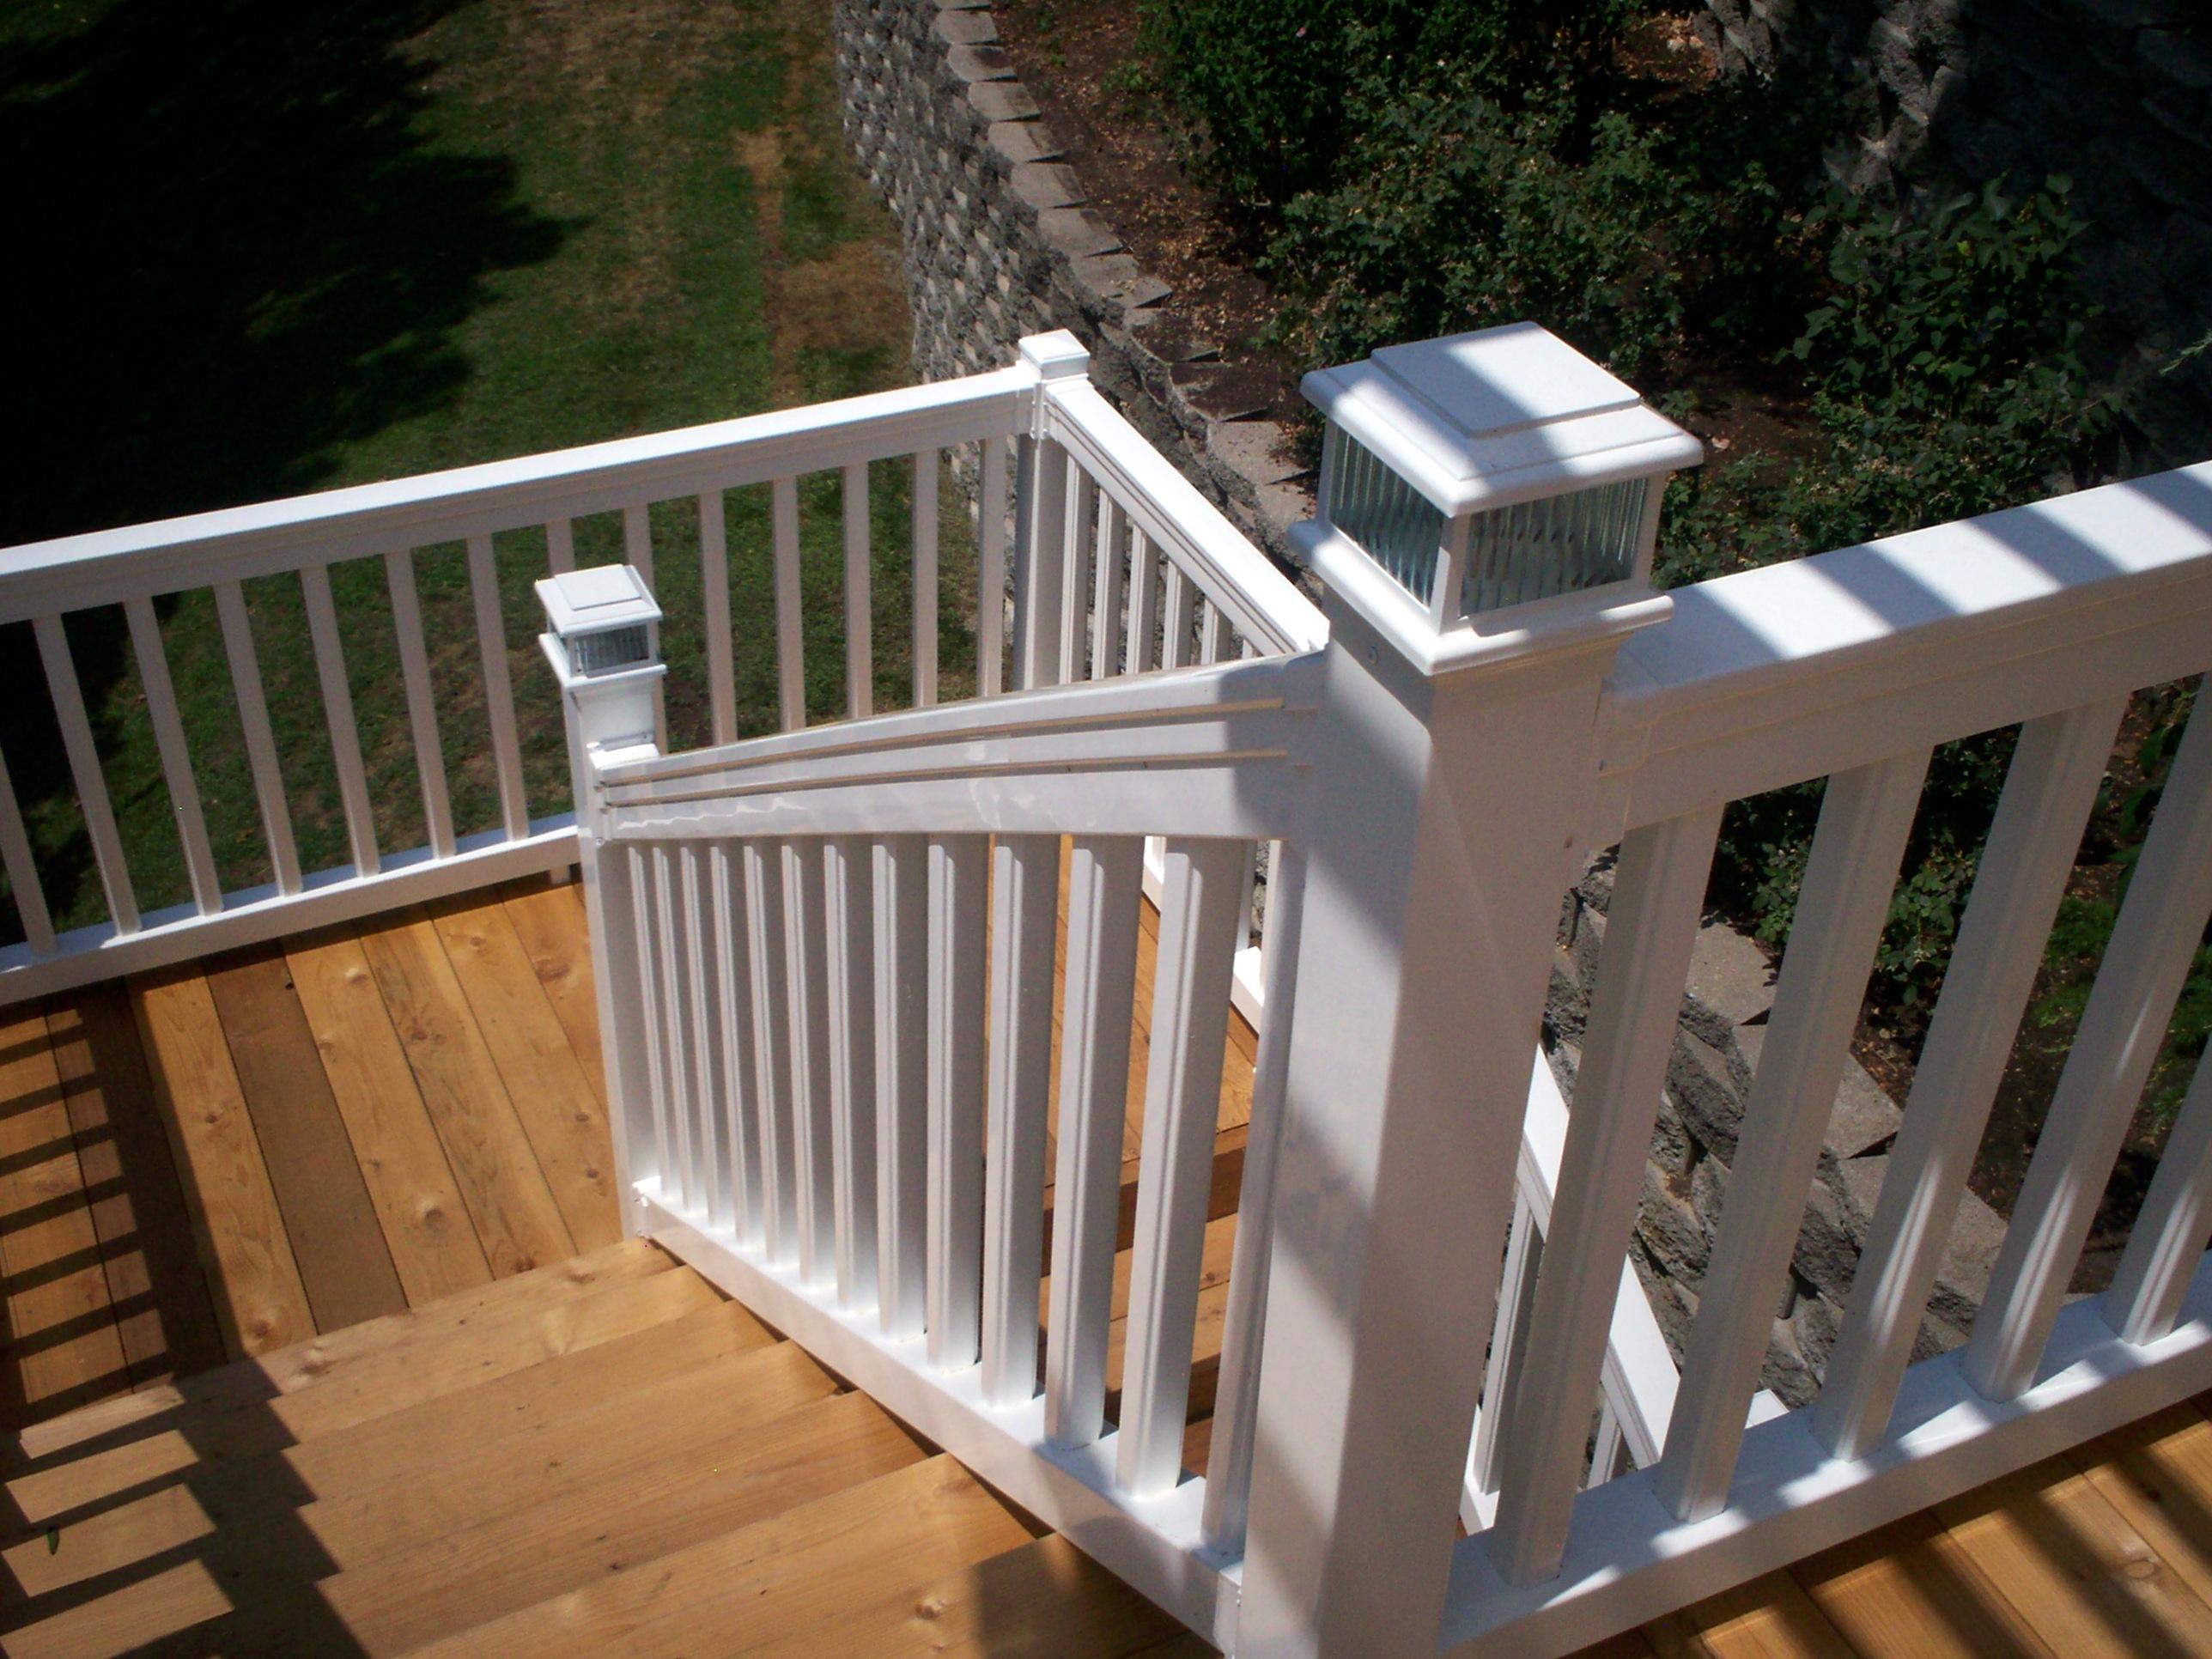 Deck Design Ideas Real Wood vs Decks That Look Like Wood  St Louis decks screened porches